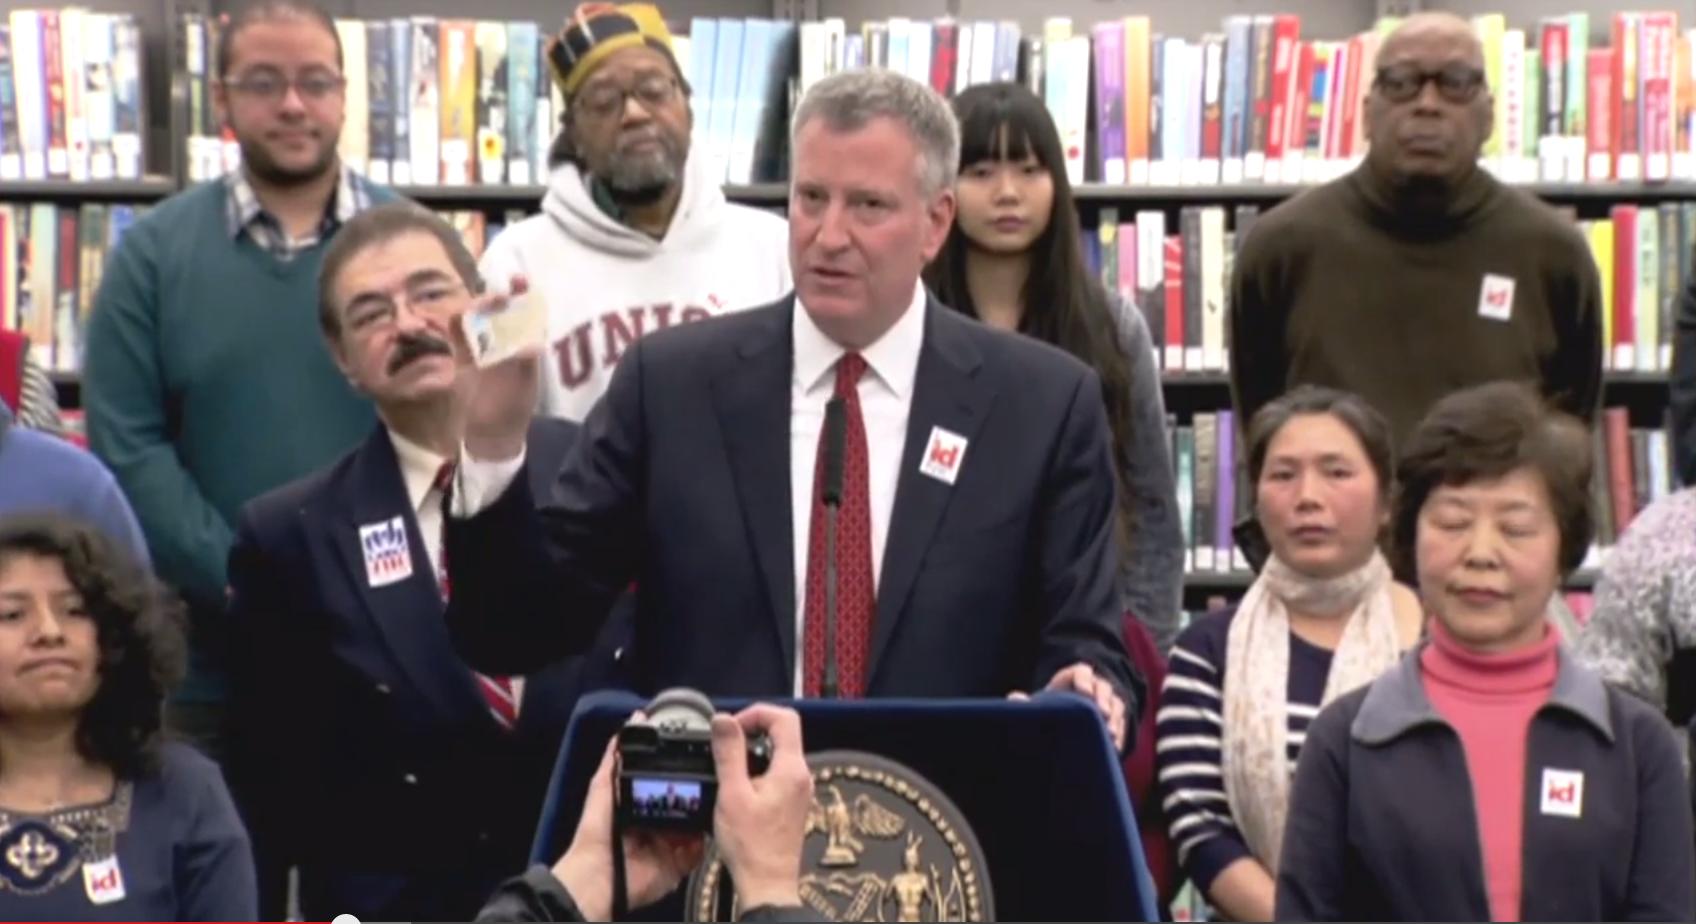 Mayor Bill de Blasio shows off his new municipal I.D. card. (Screengrab: Youtube)